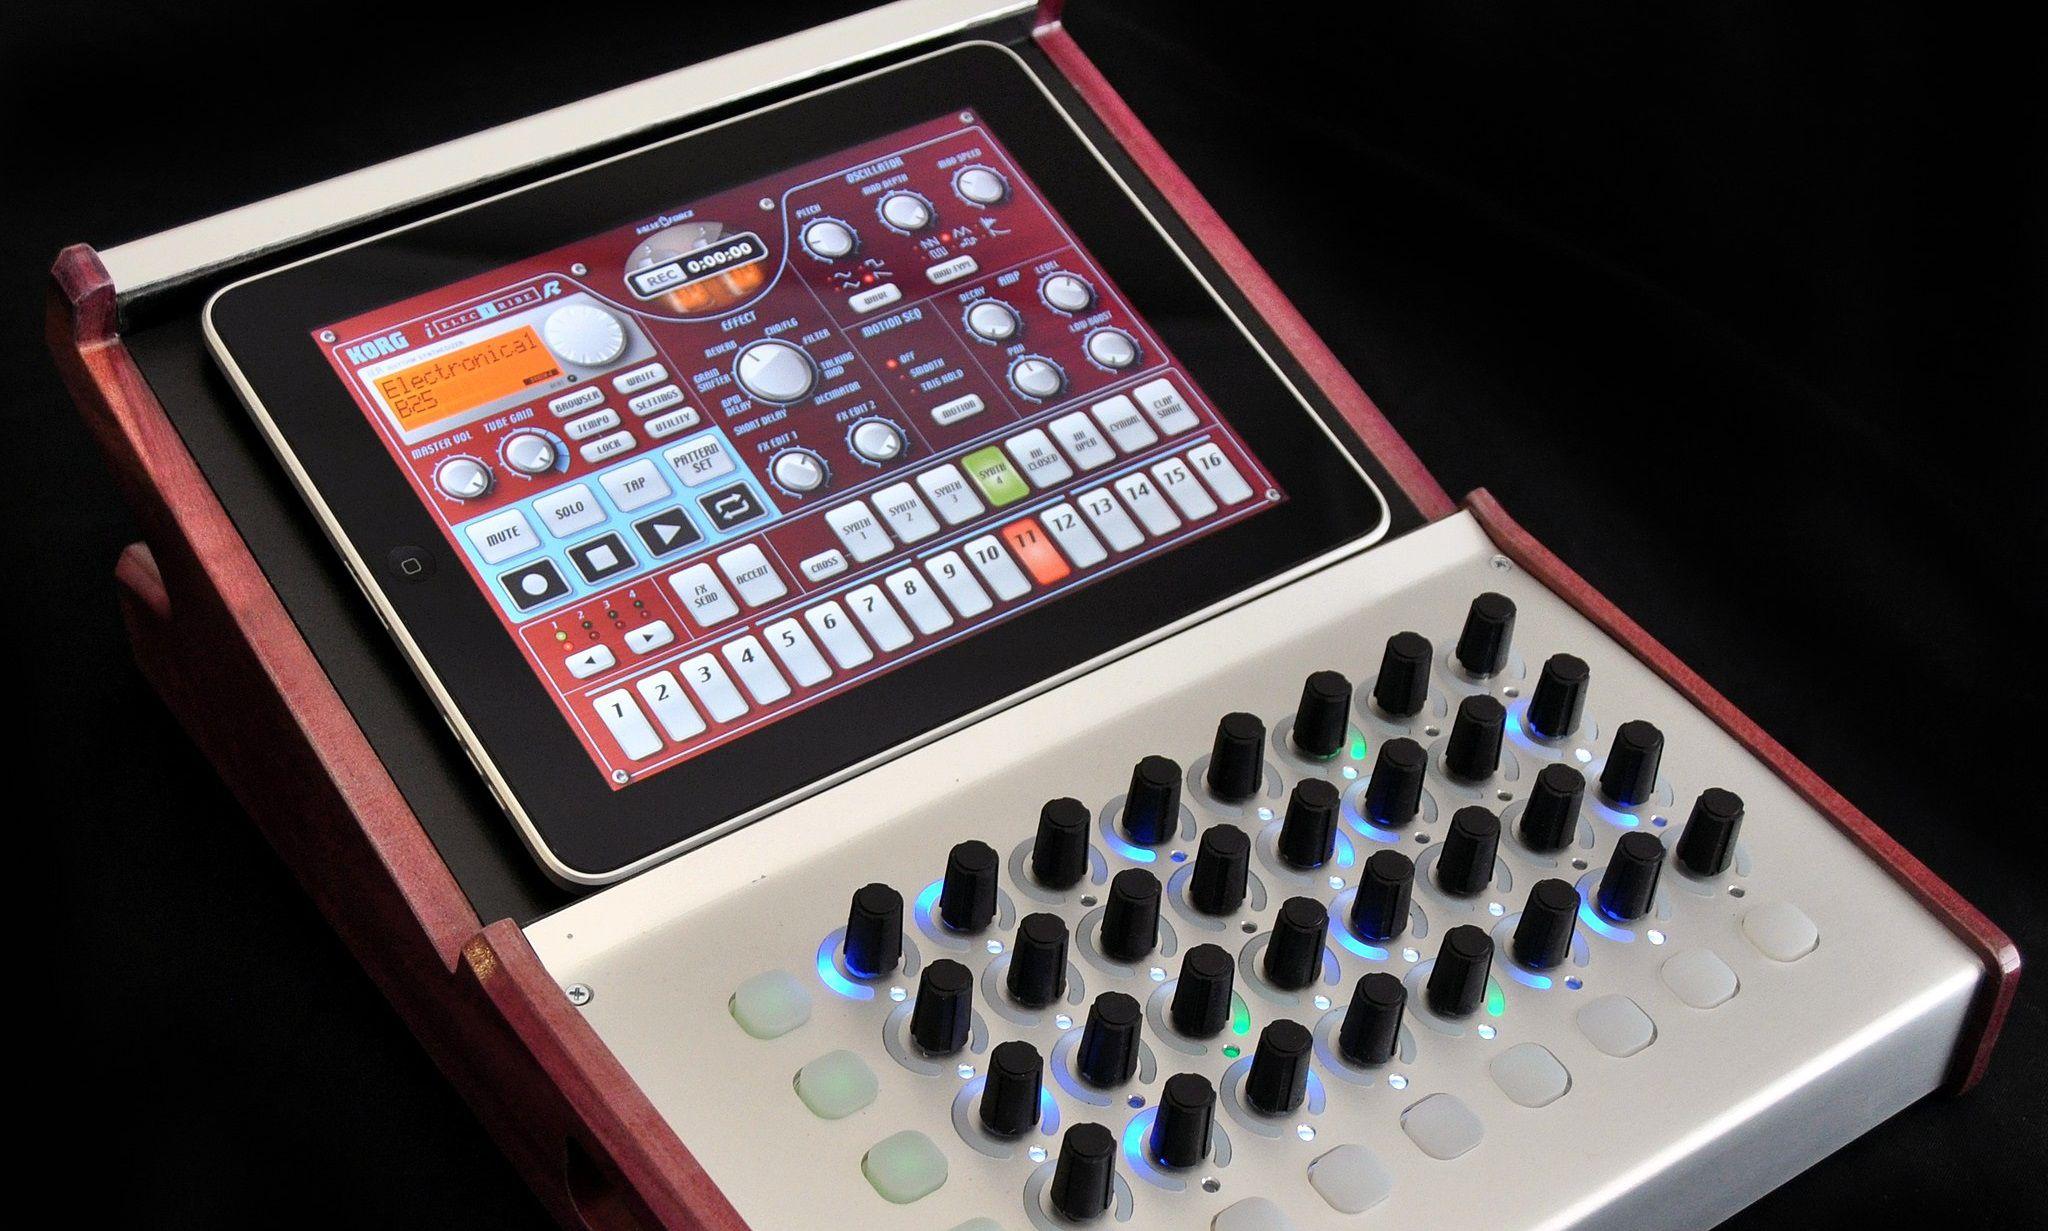 How to Use Your iPad as a Wireless MIDI Controller (Mac/Windows)